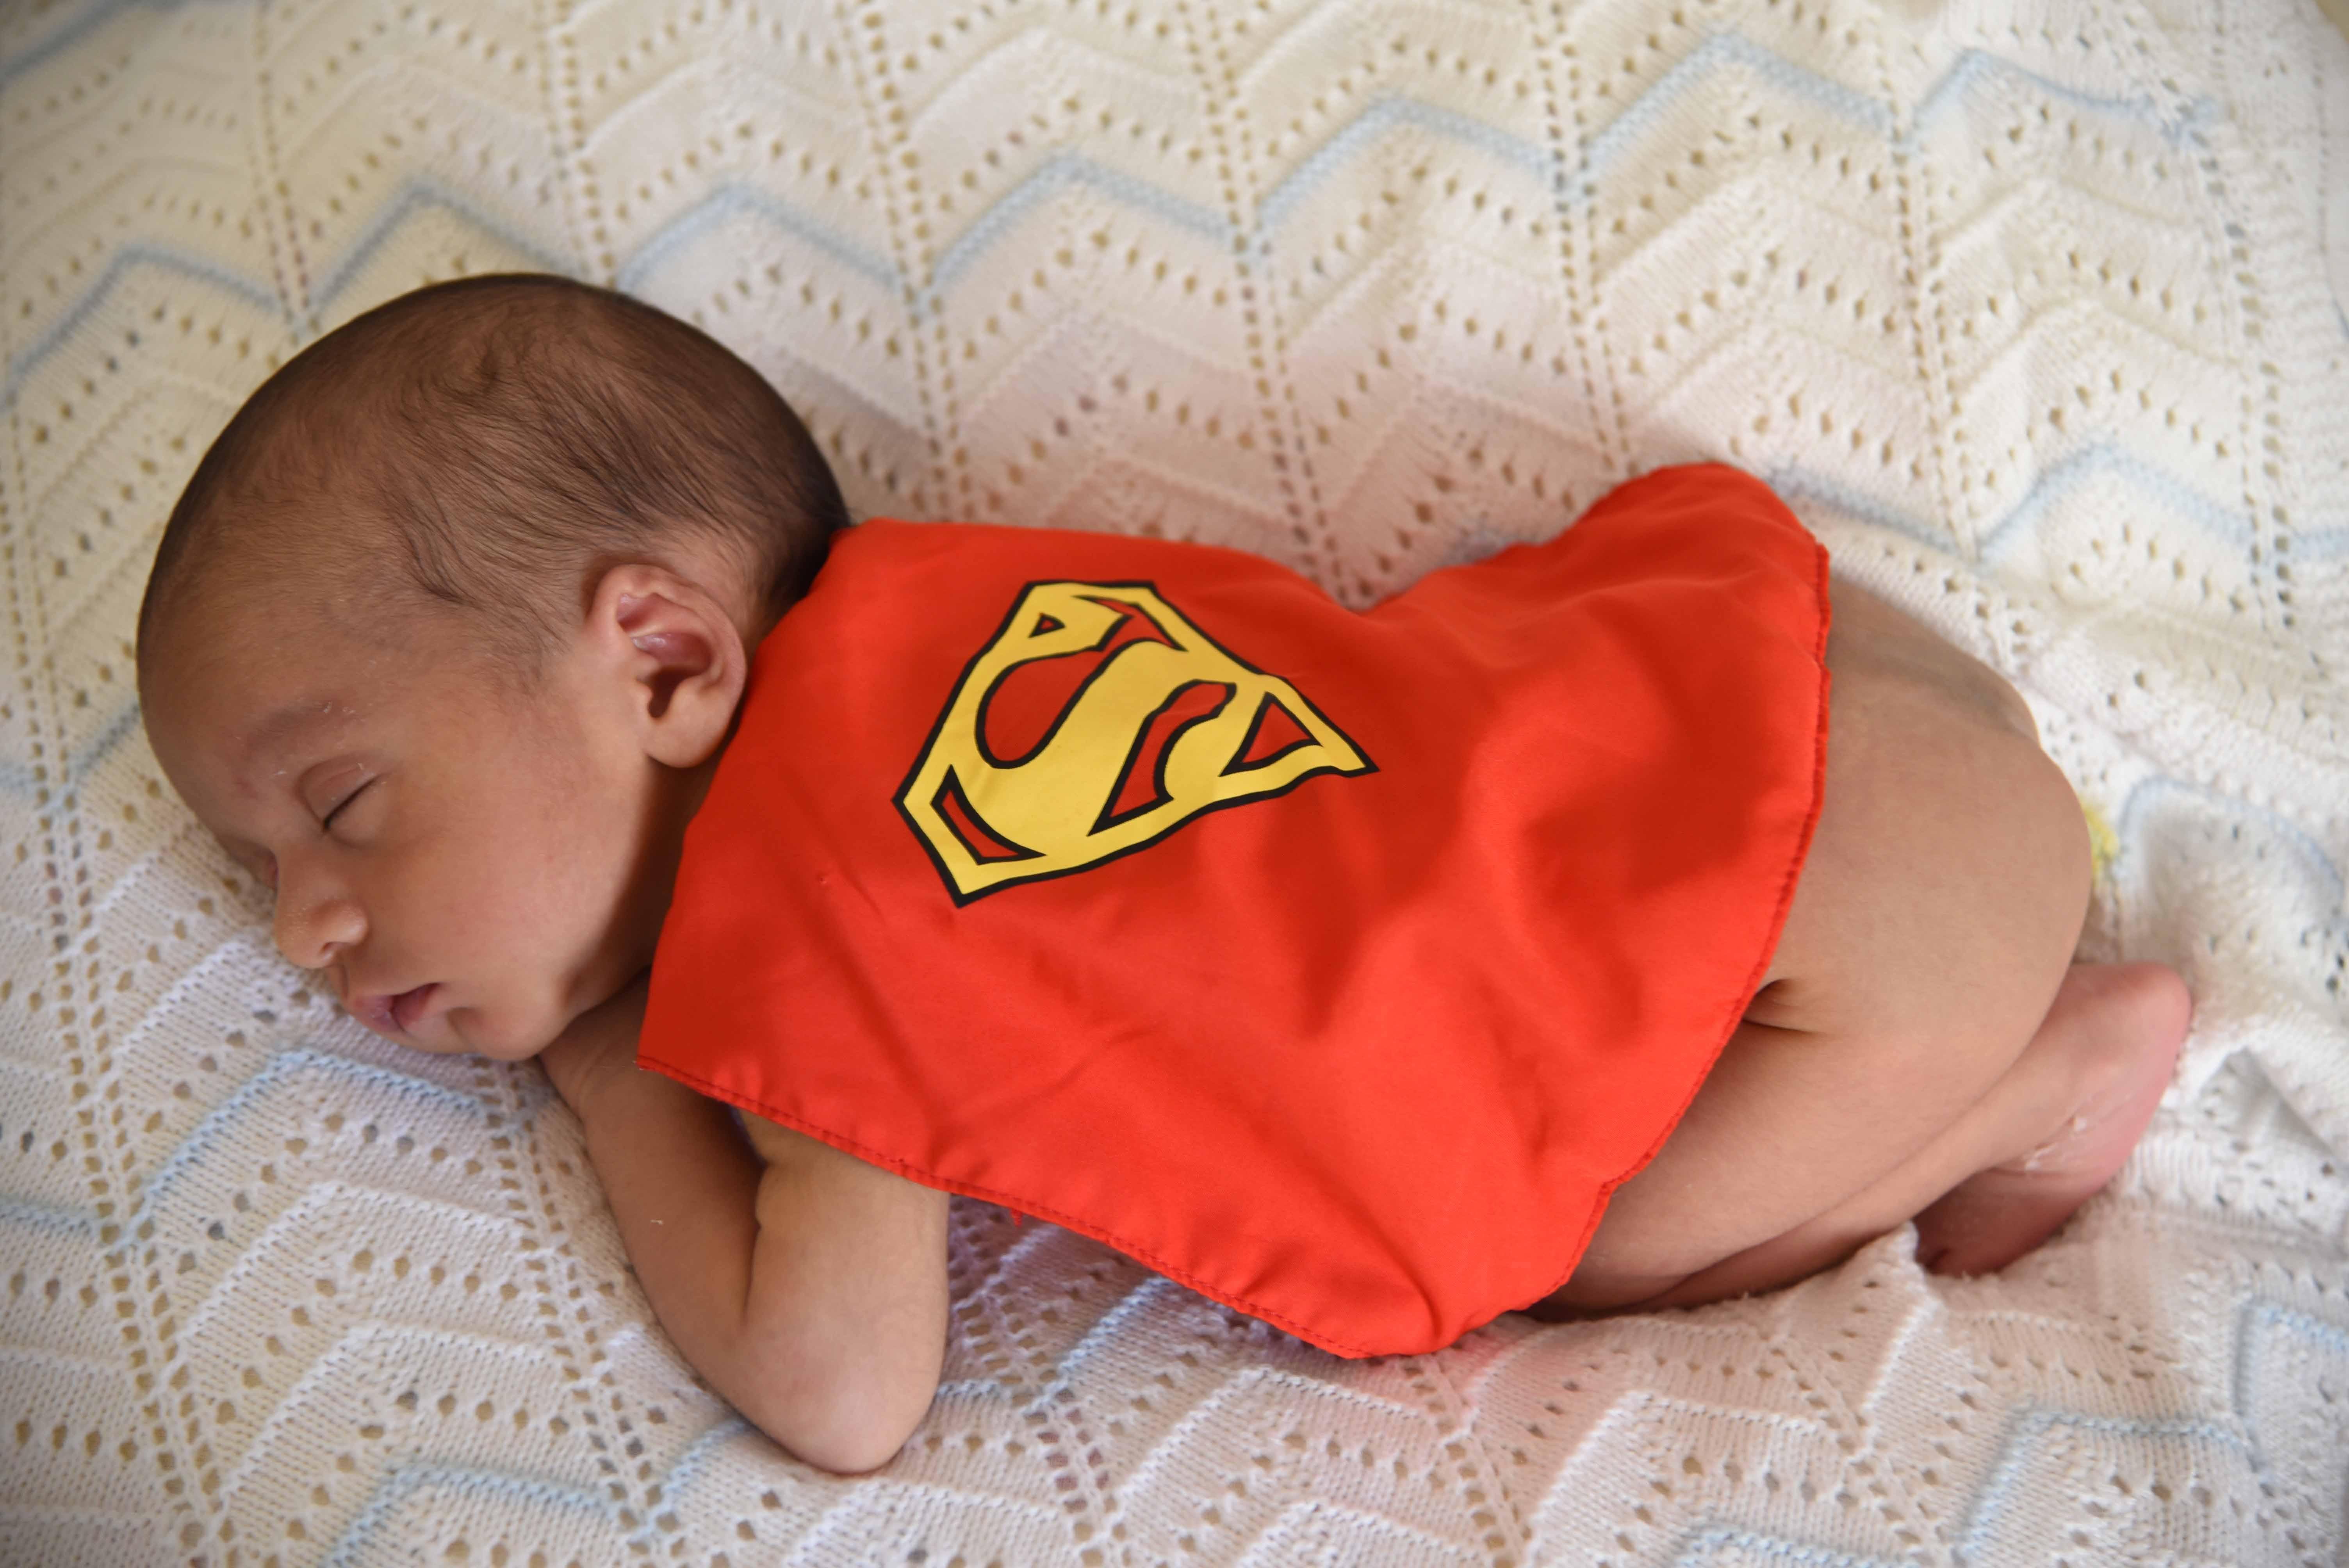 Shruttigarg_newborn photography-11